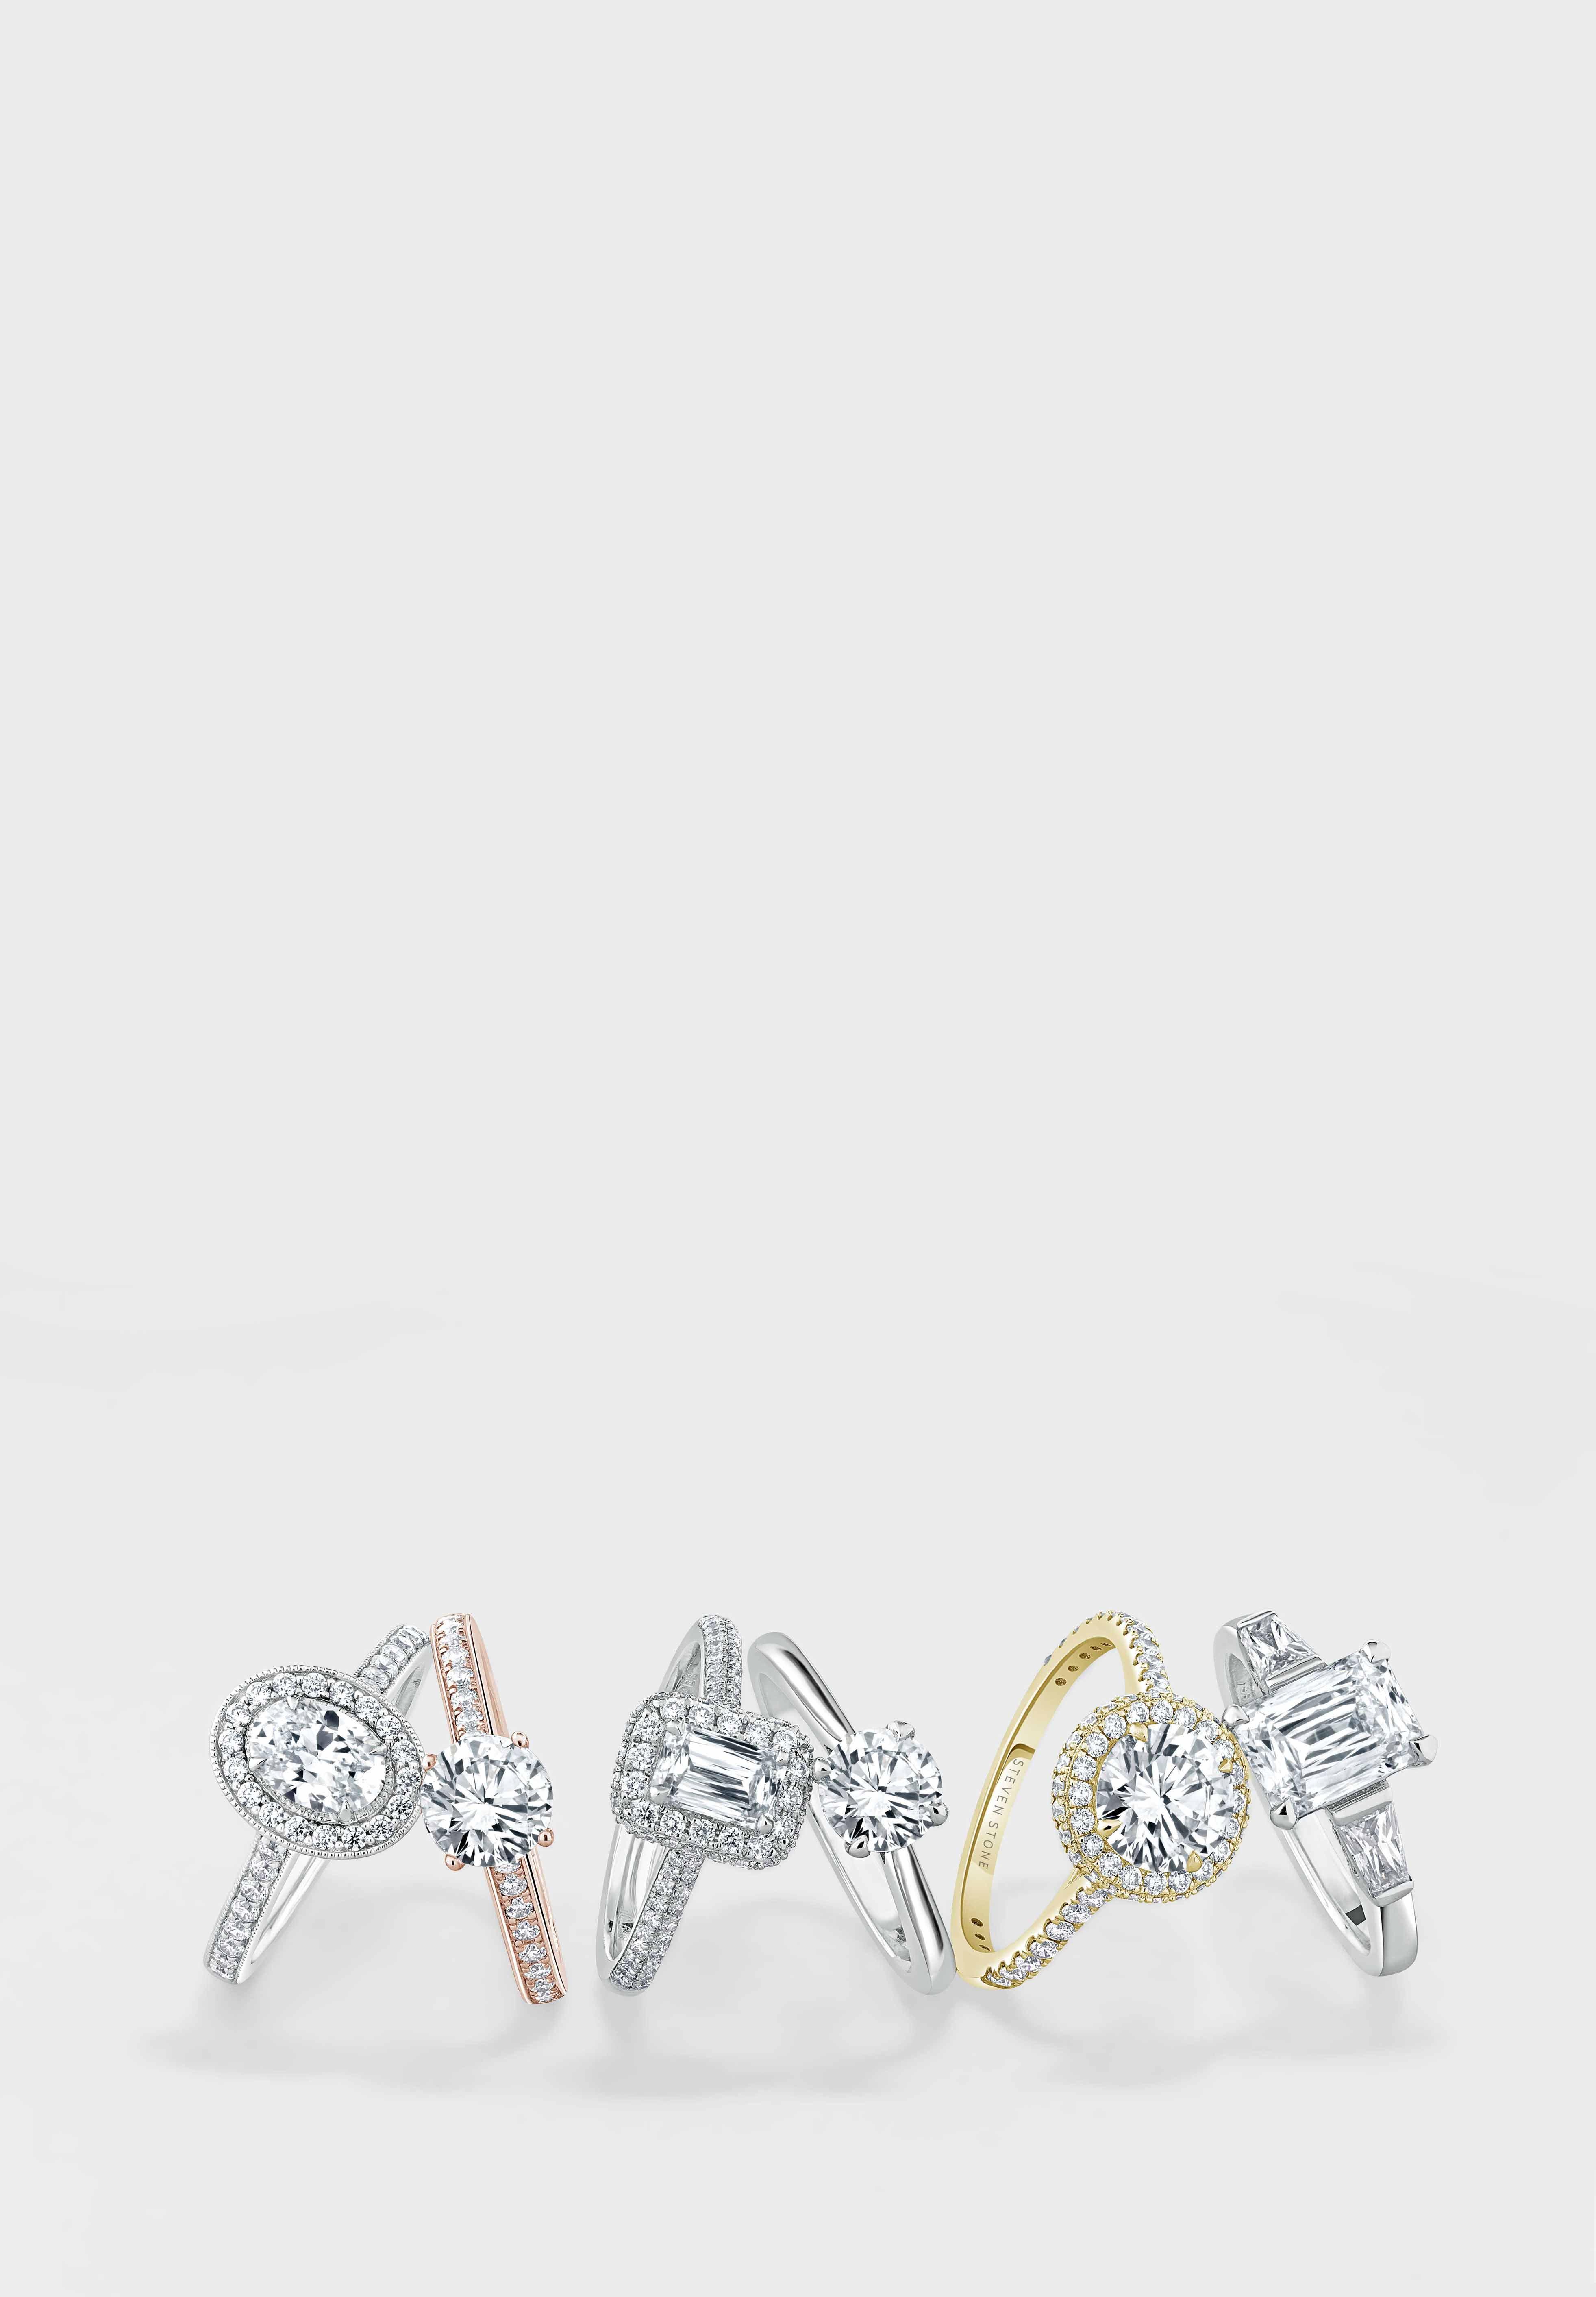 Yellow Gold Cushion Cut Engagement Rings - Steven Stone